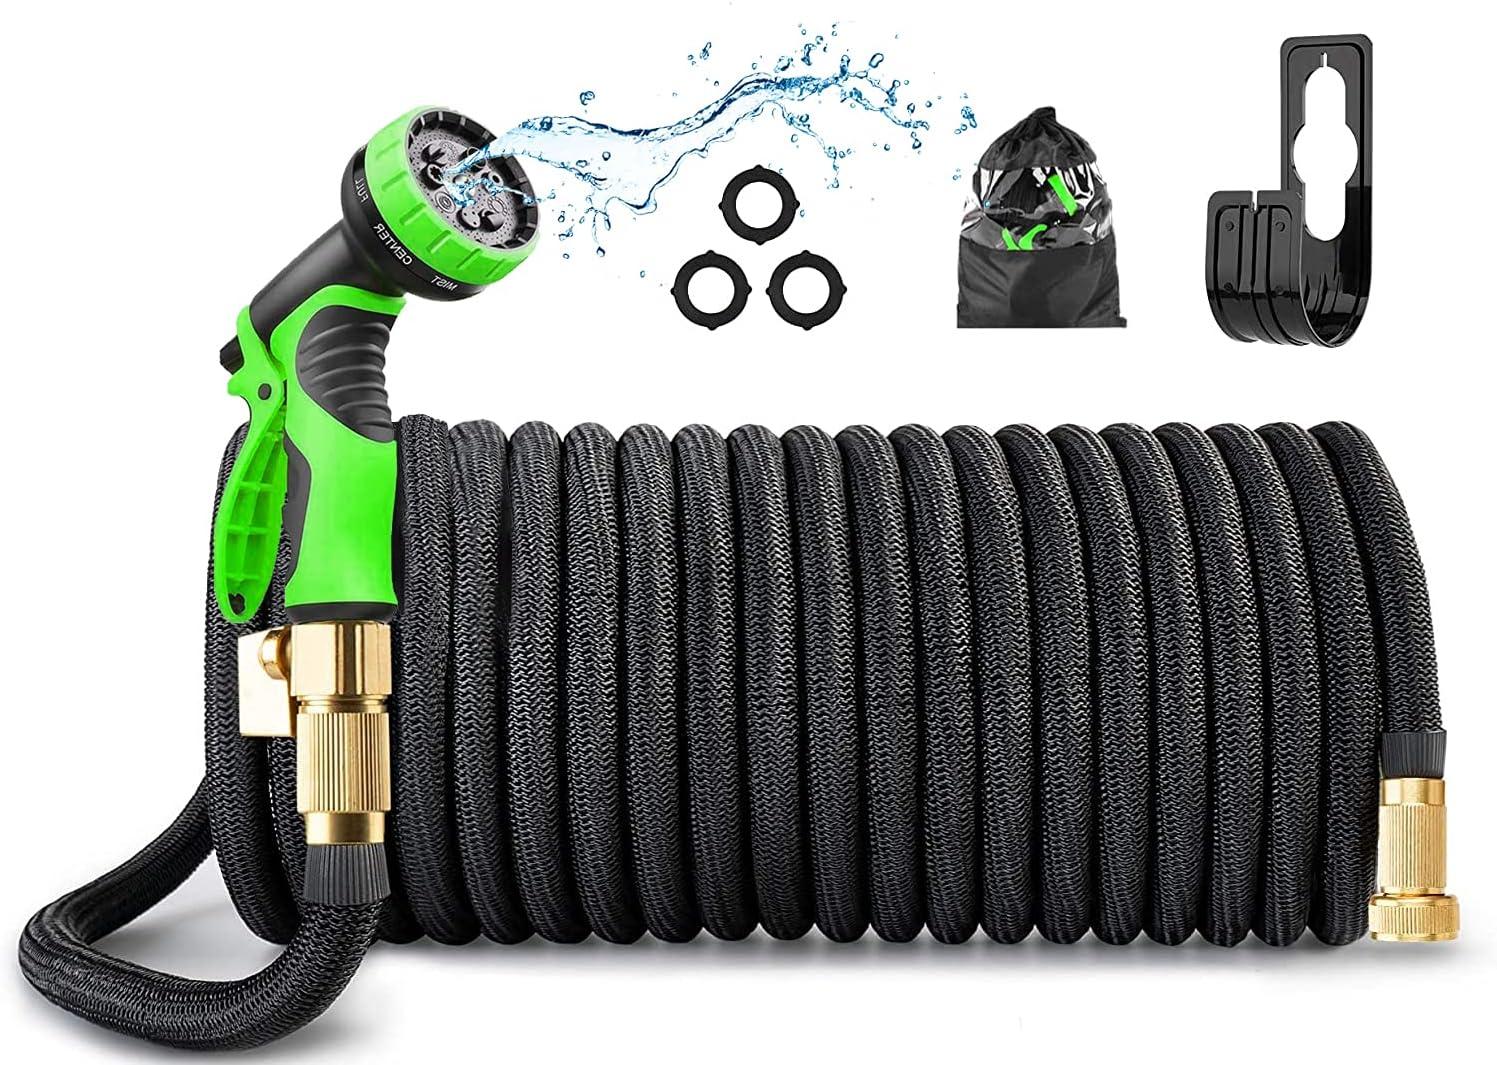 COUAH 50ft Garden Hose,Expandable Garden Hose with 9 Function Nozzle, Leak-proof Lightweight Retractable Hose with 3/4